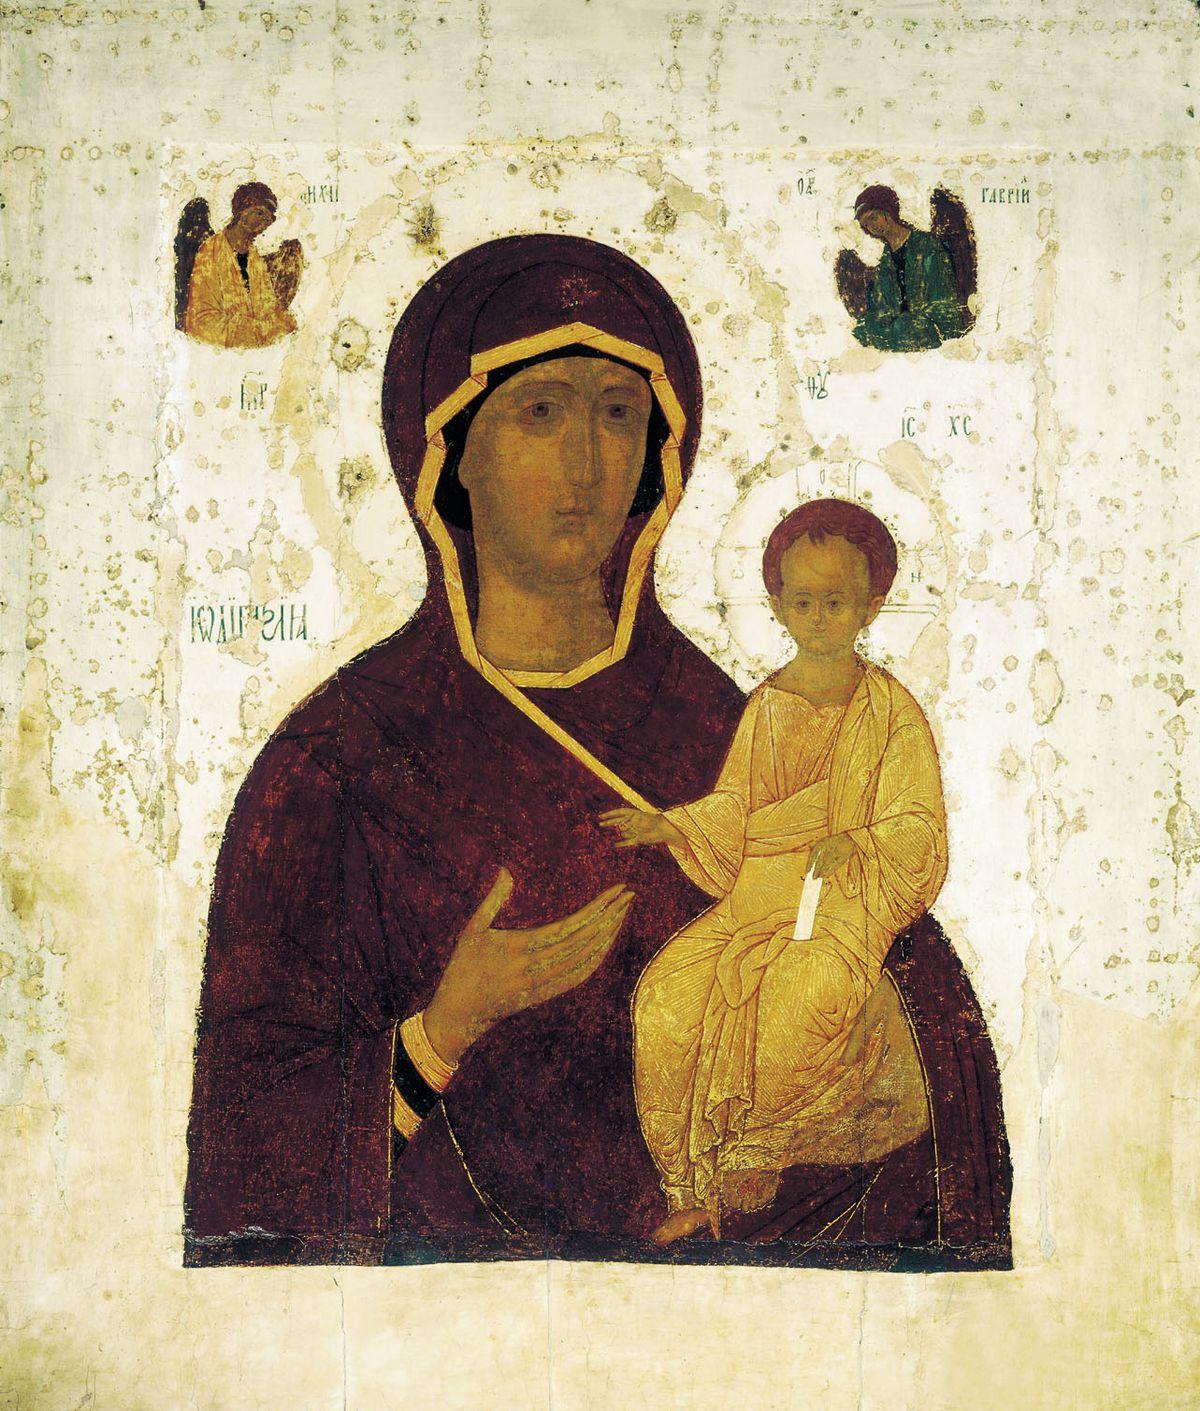 Смоленская икона Божией Матери ...: www.pravmir.ru/ikonografiya-smolenskoj-ikony-bogomateri-odigitrii